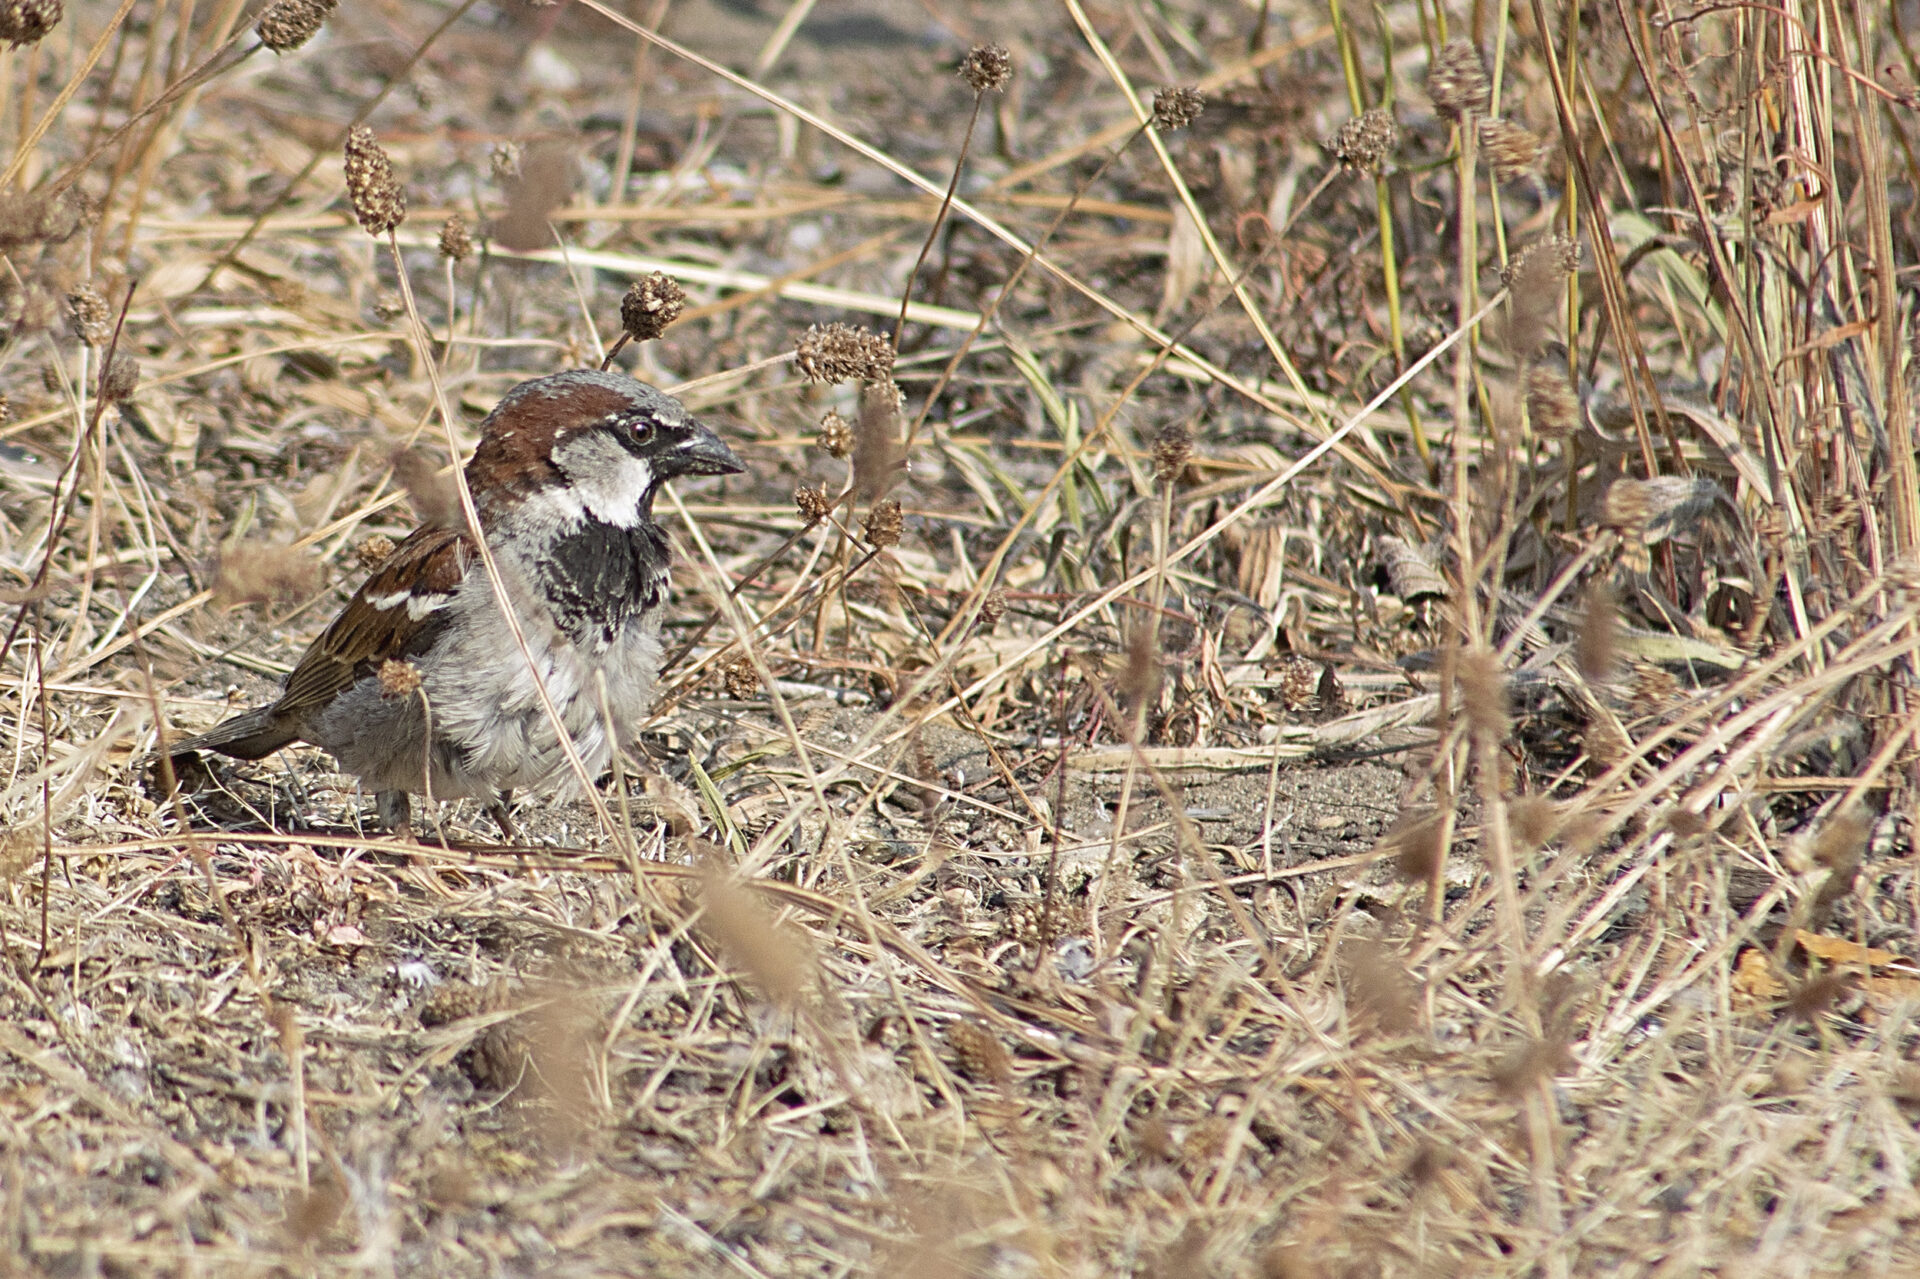 House Sparrow, July 2, 2021